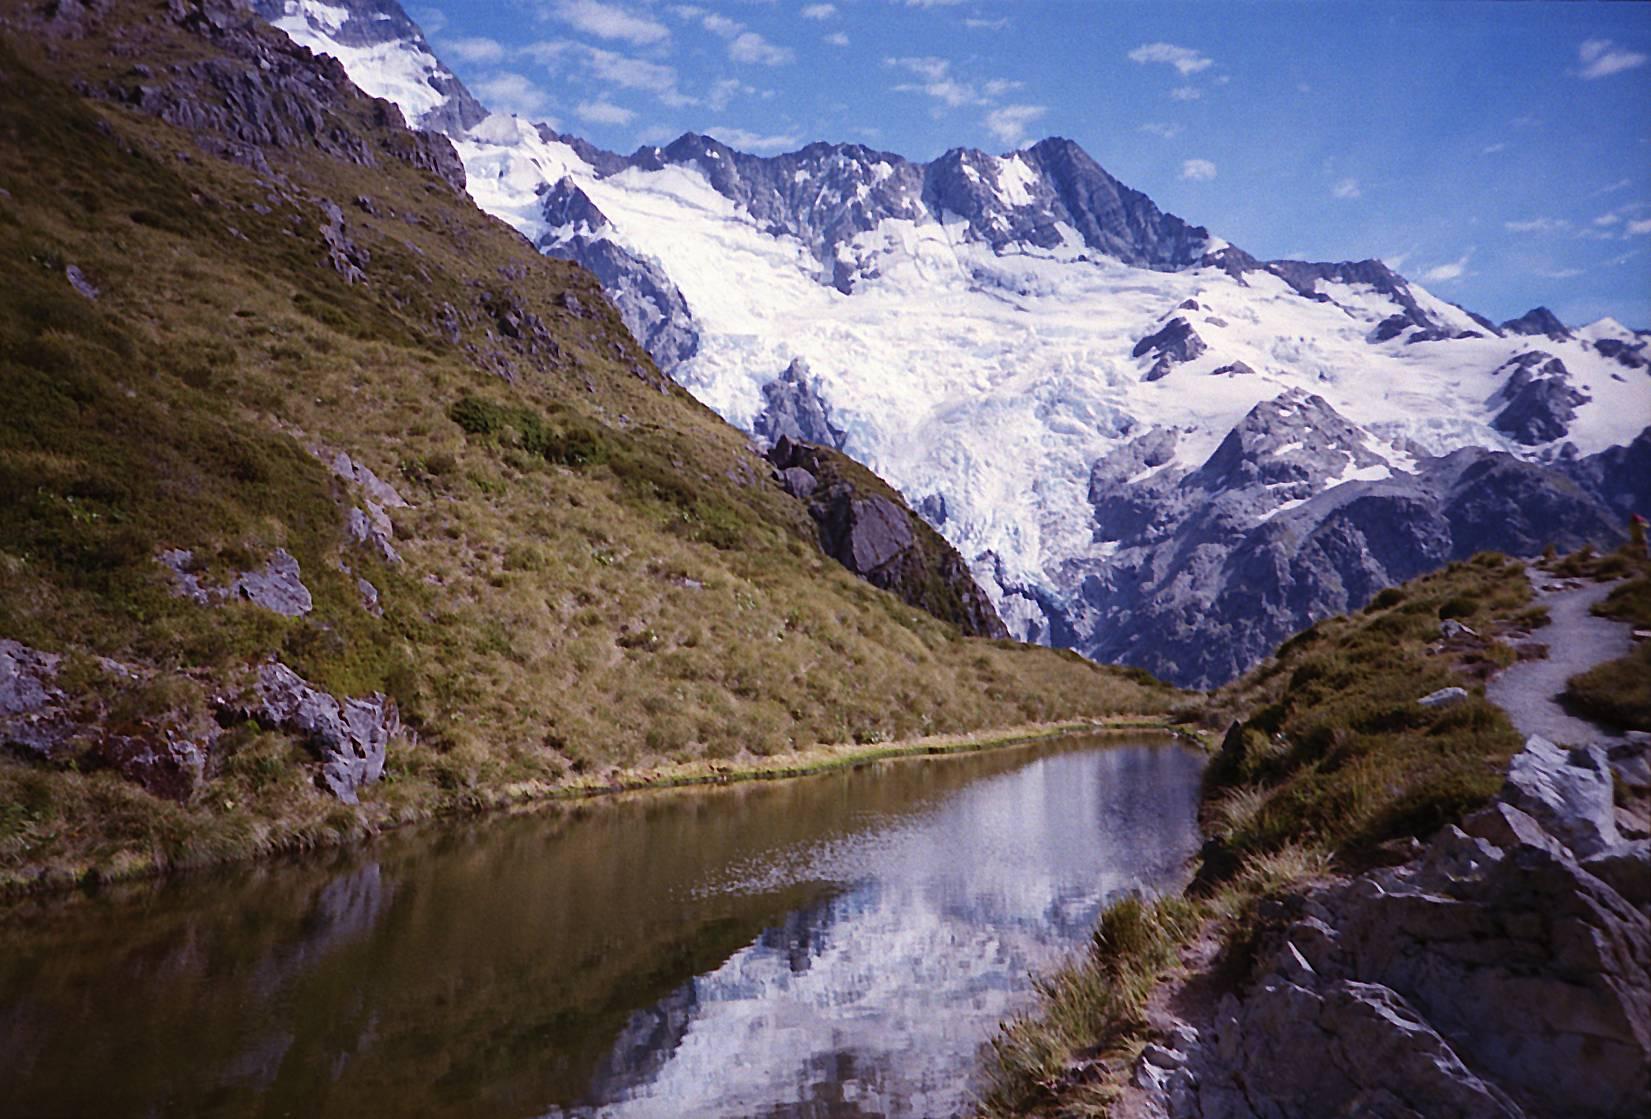 Lake Tekapo - Nova Zelândia de norte ao sul